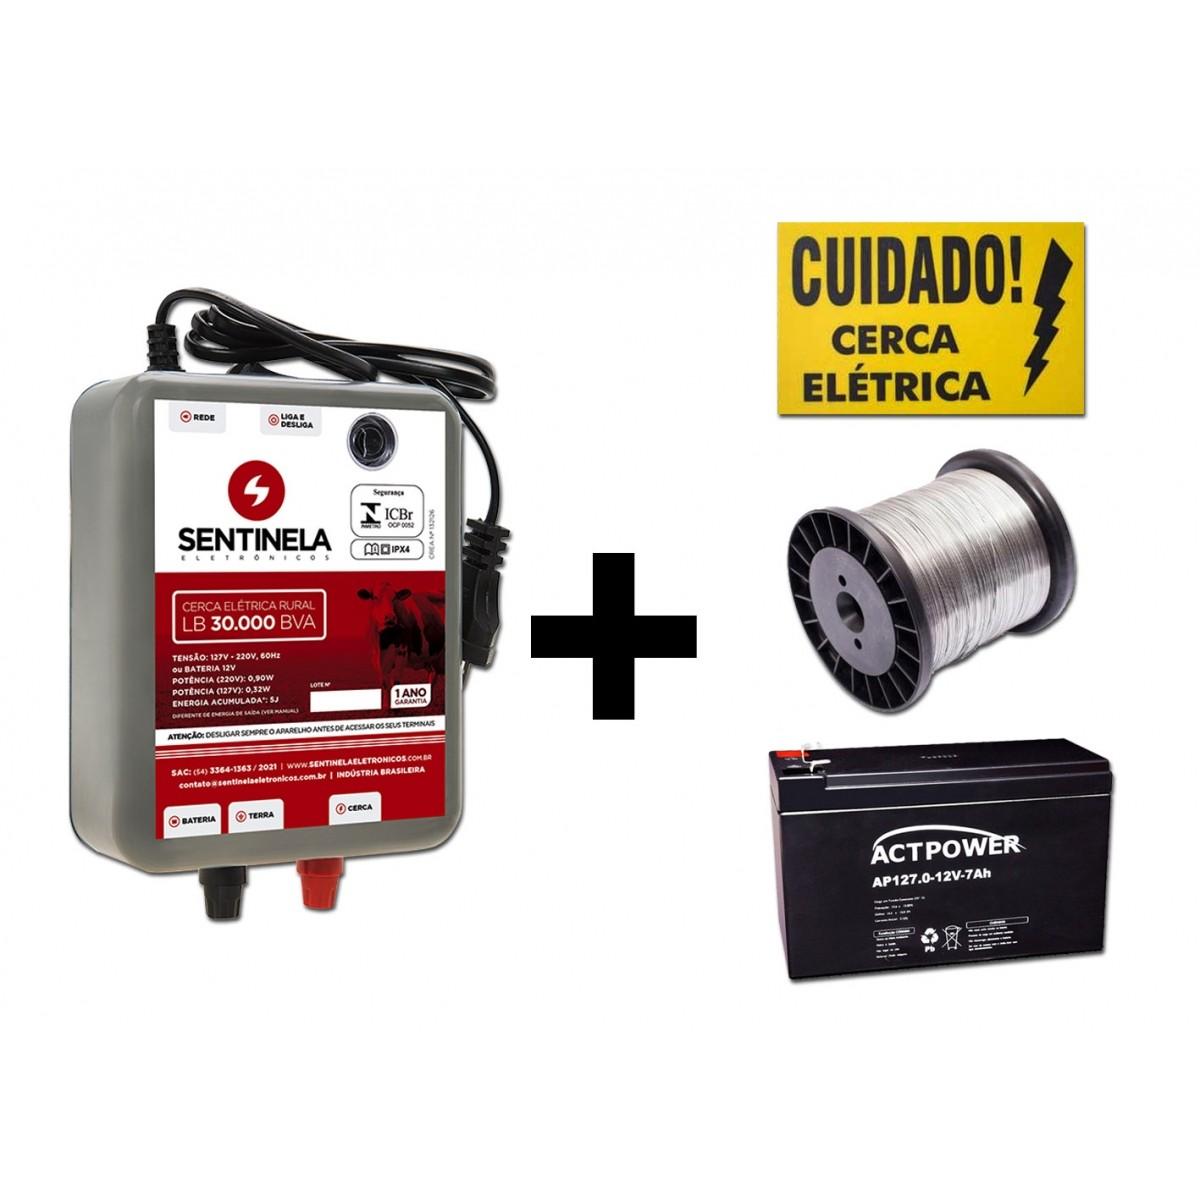 kIt Eletrificador de Cerca Rural 30km Bivolt + Bateria Gel 7ah + Arame + Placa